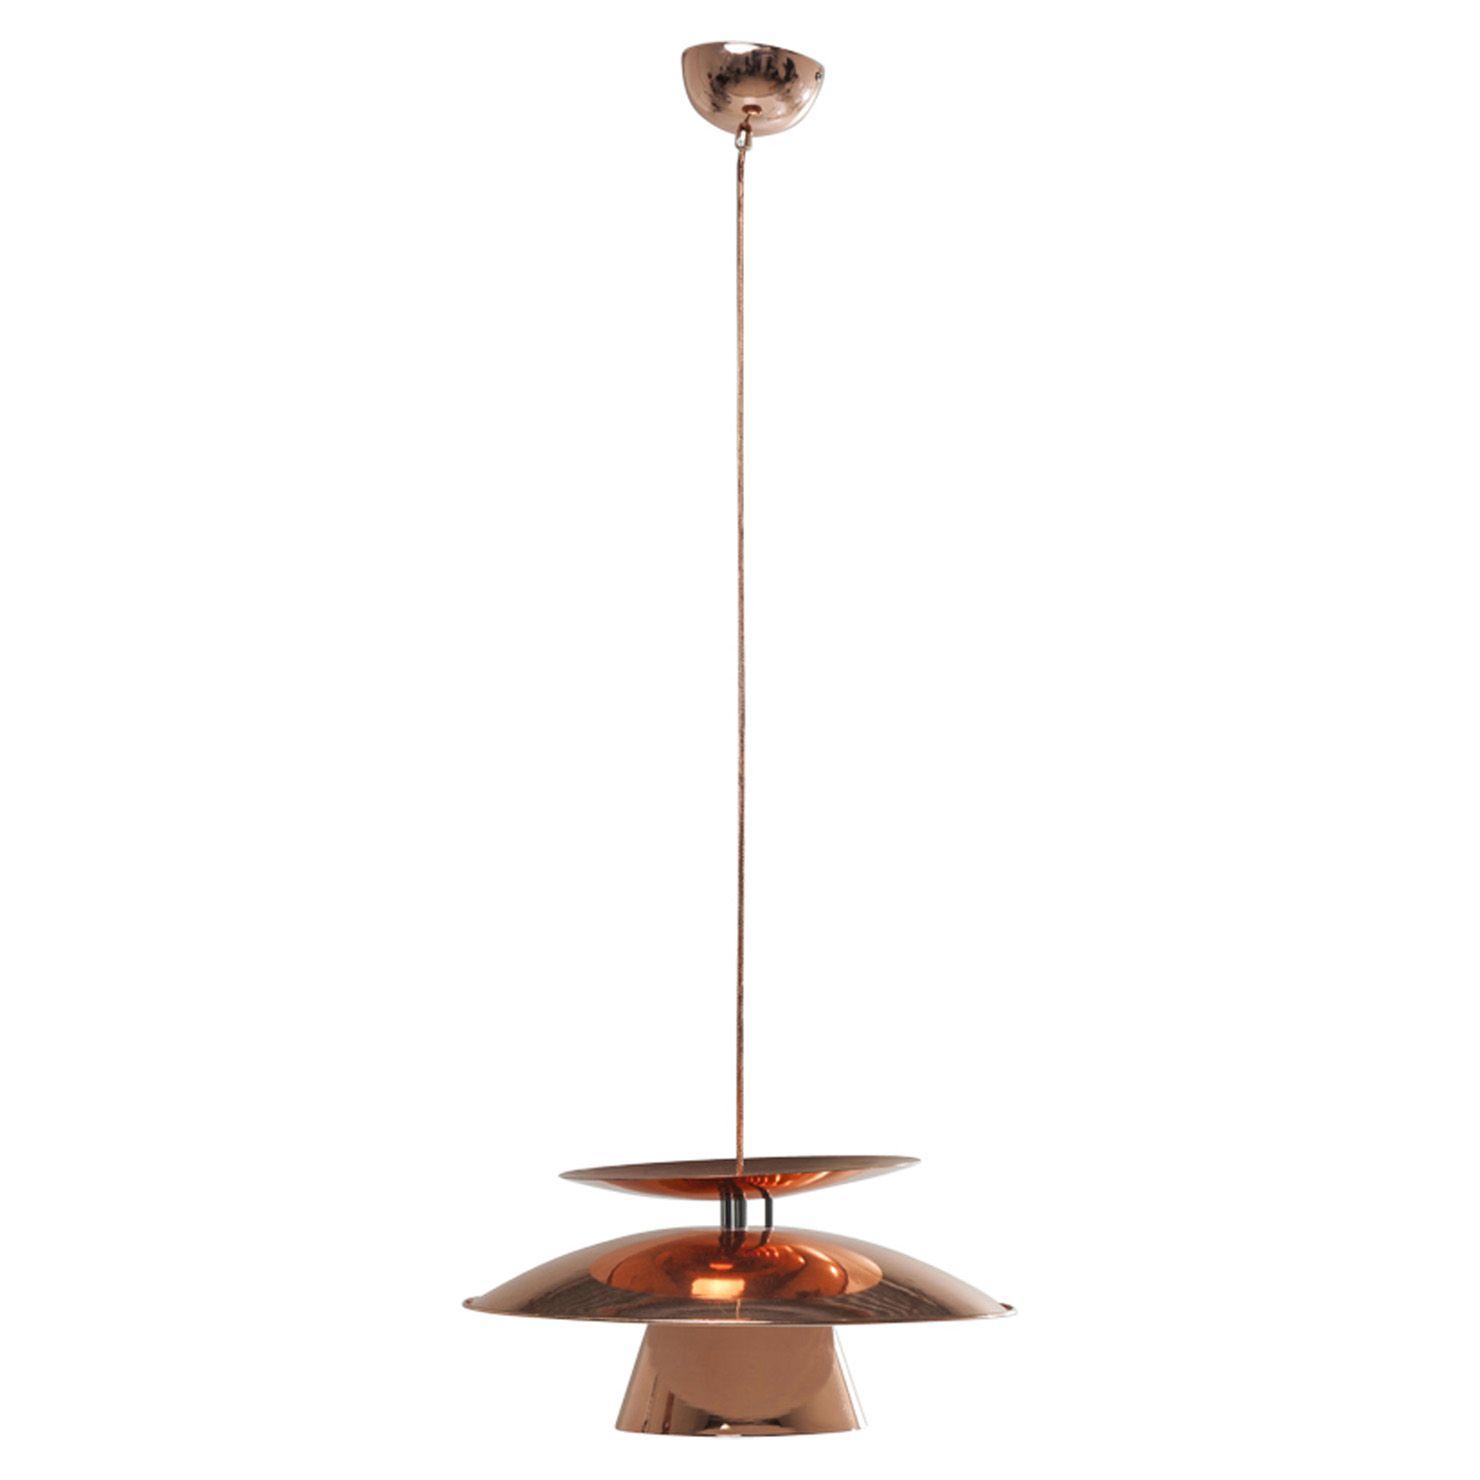 Copper flying saucer pendant lamp flying saucer and pendant lamps copper flying saucer pendant lamp arubaitofo Gallery